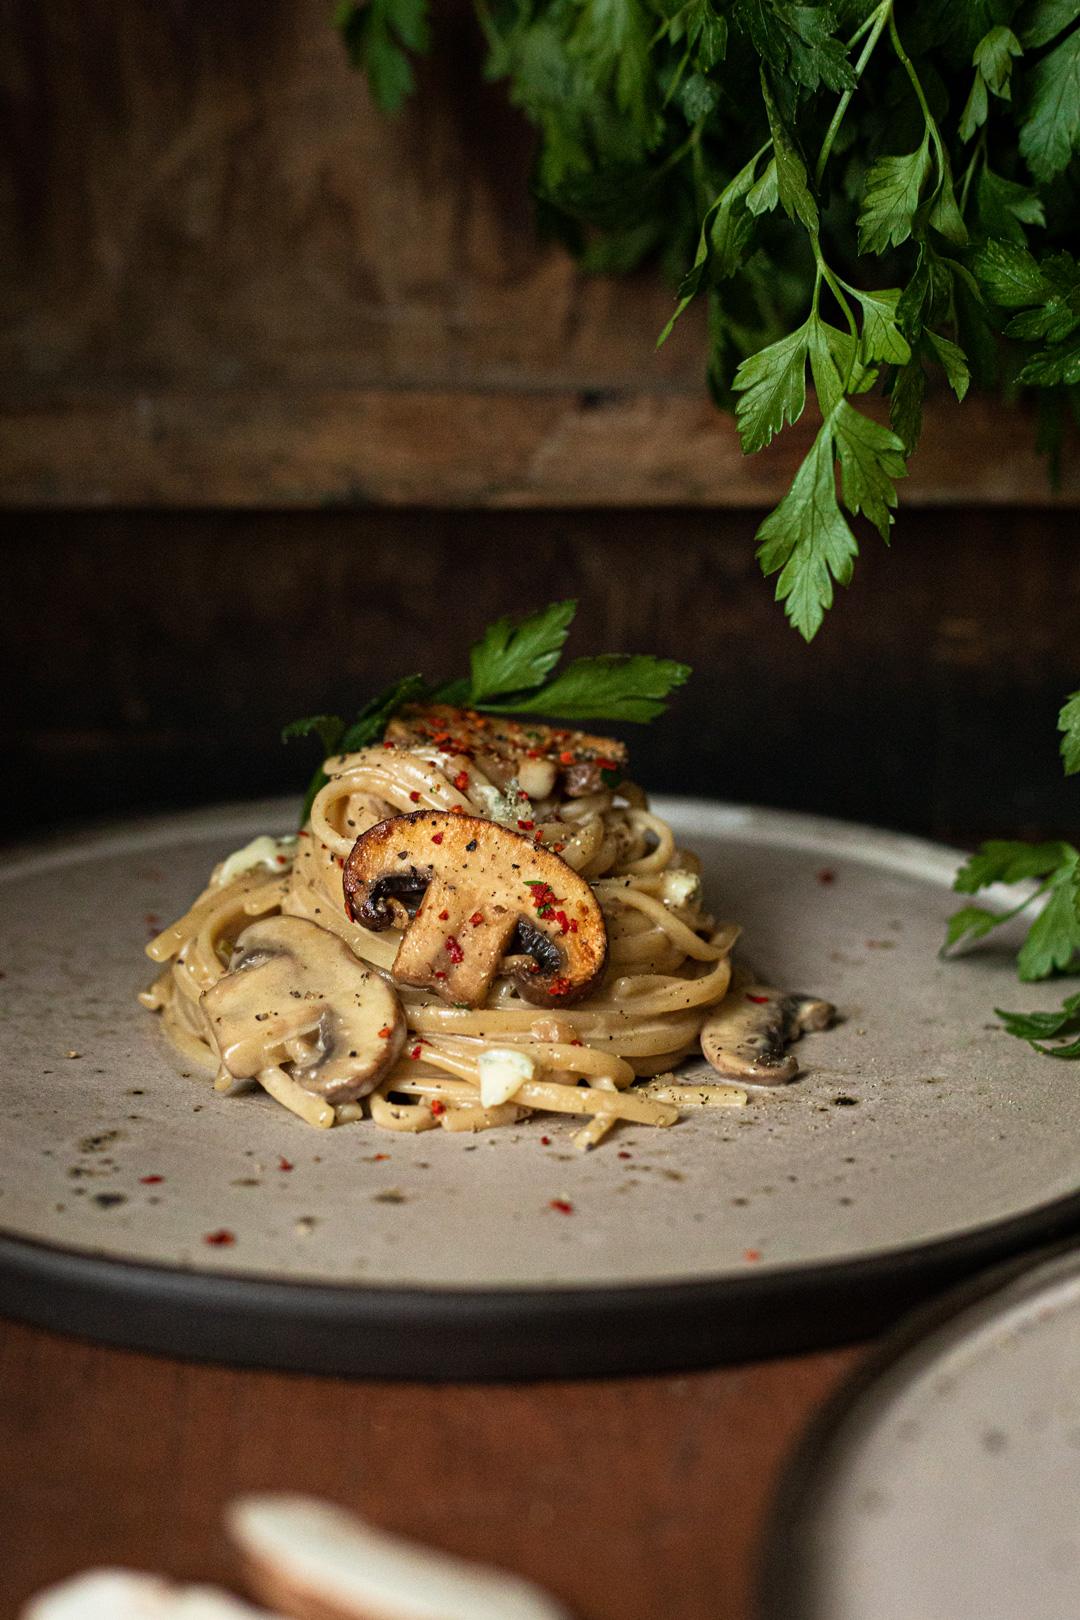 Dinkel max Linguine mit Gorgonzola-Pilz-Soße